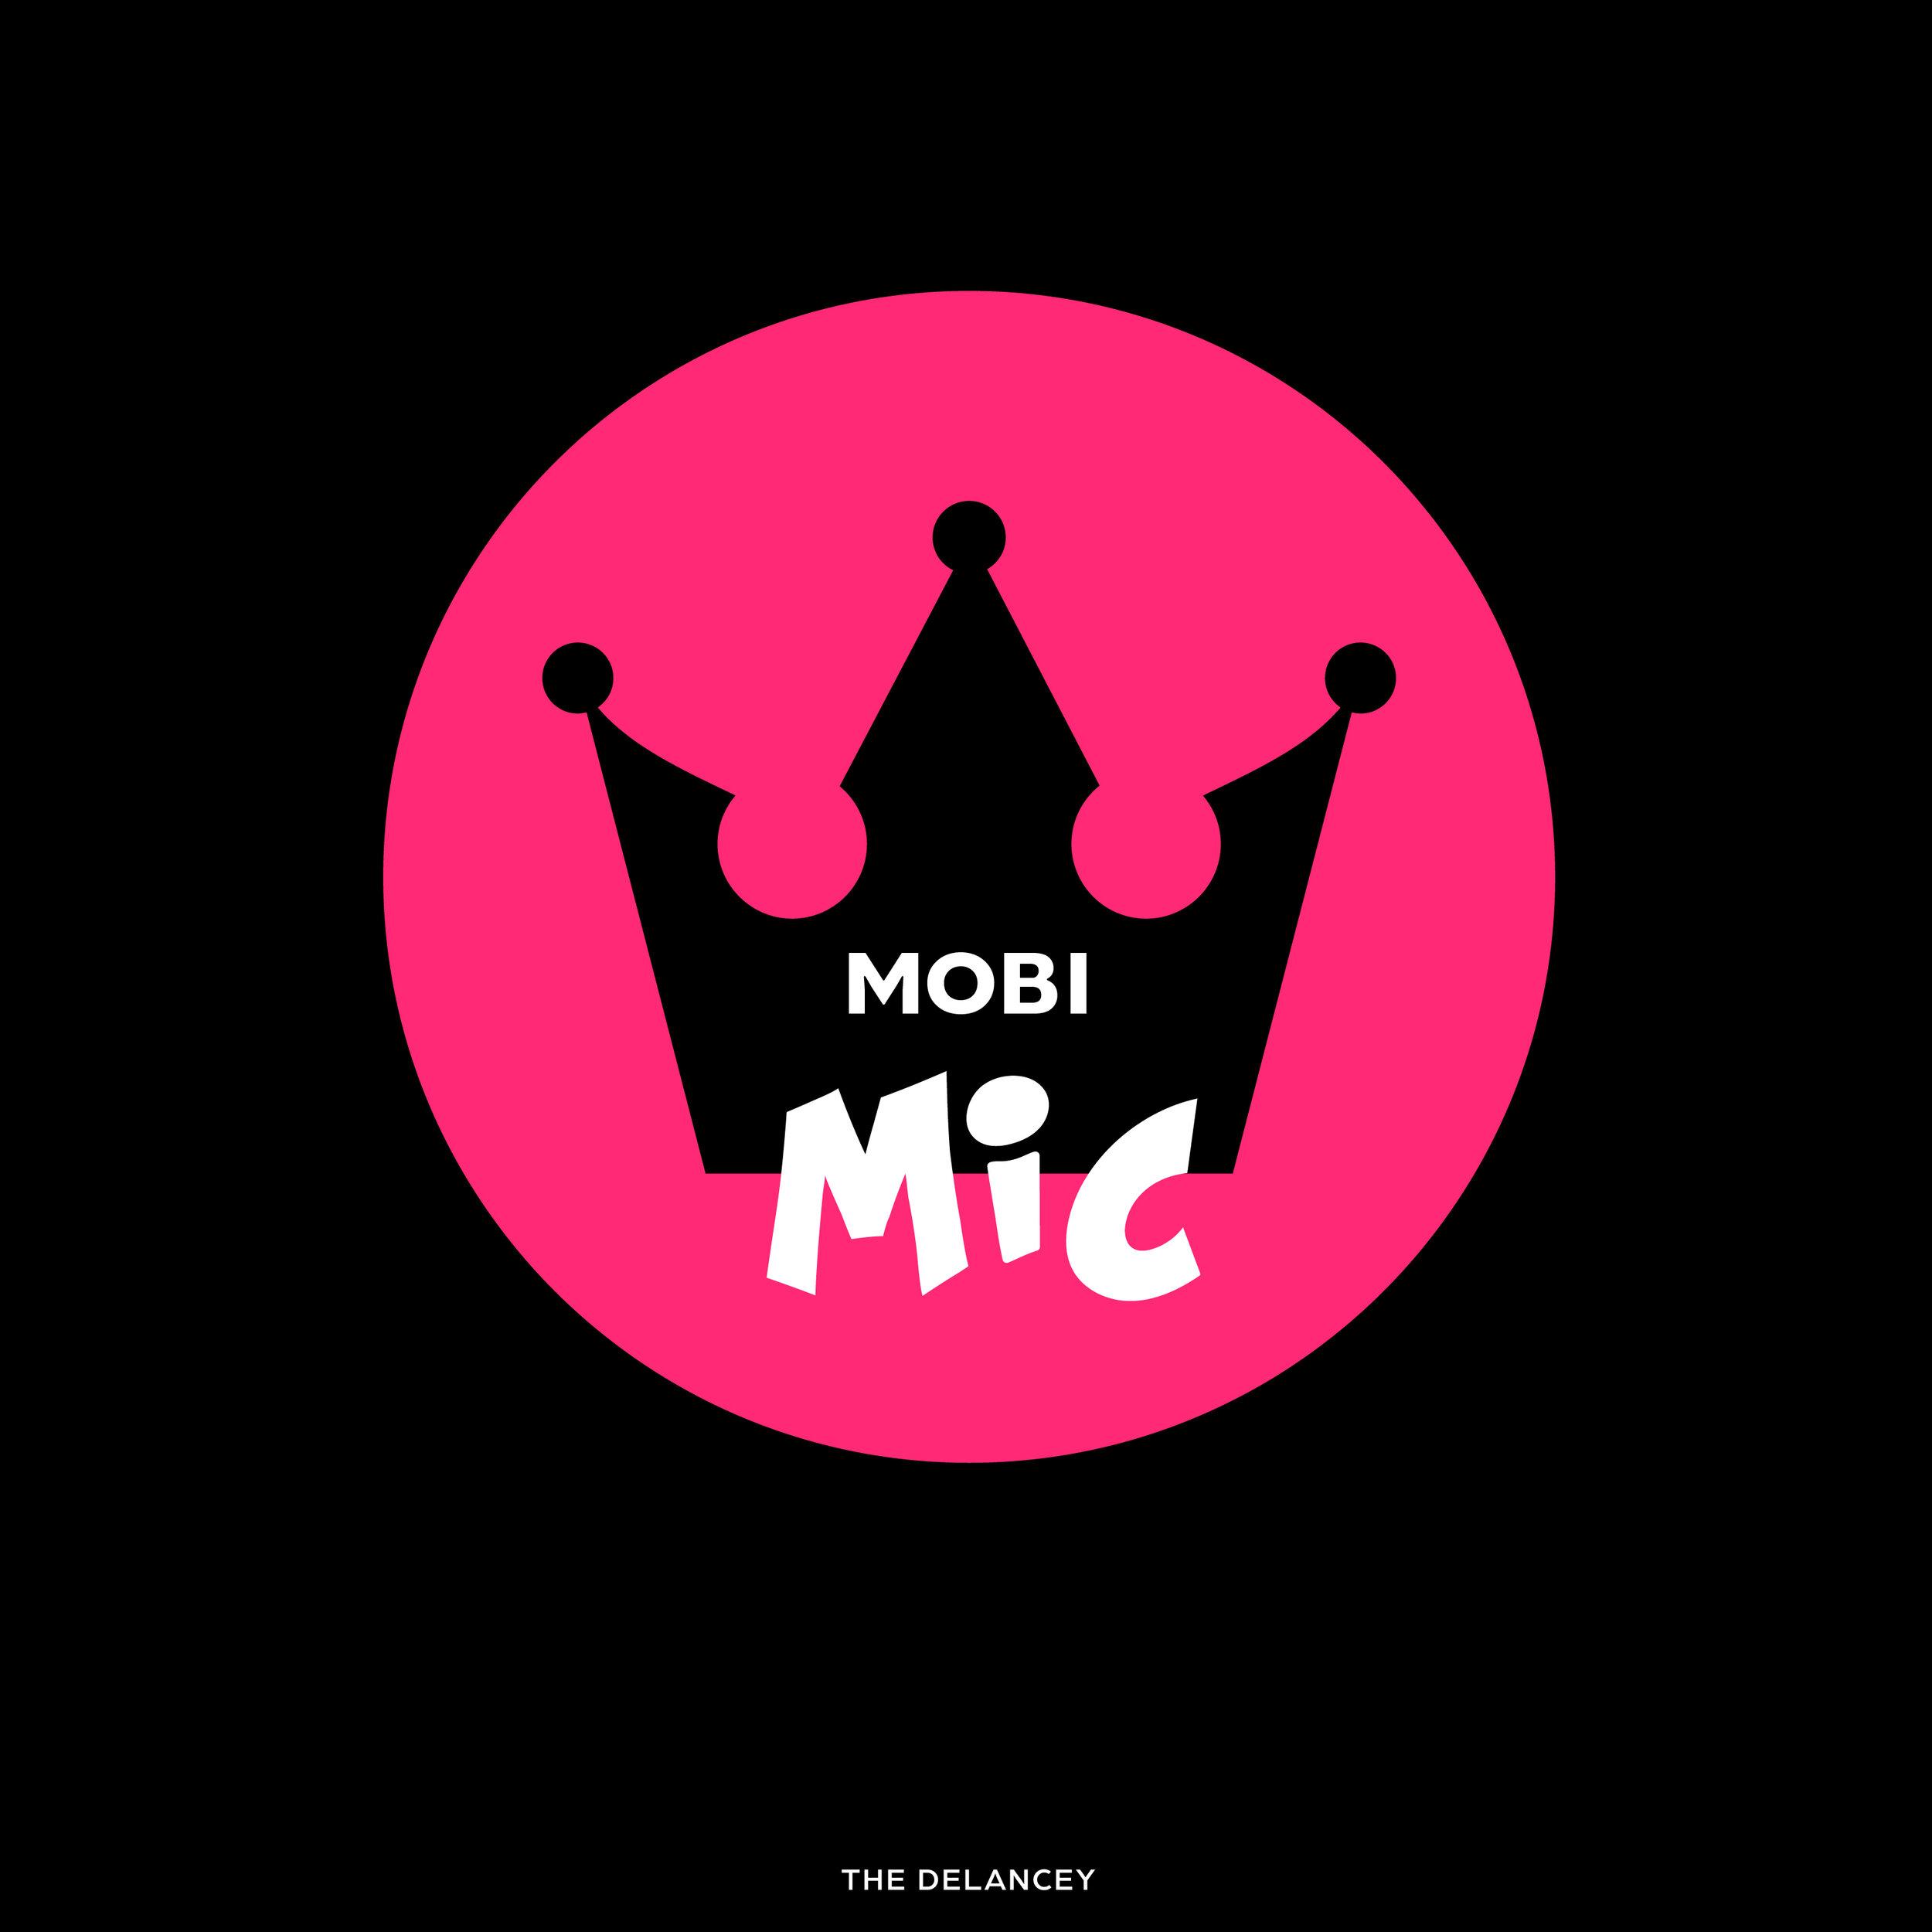 MOBImic-1.jpg